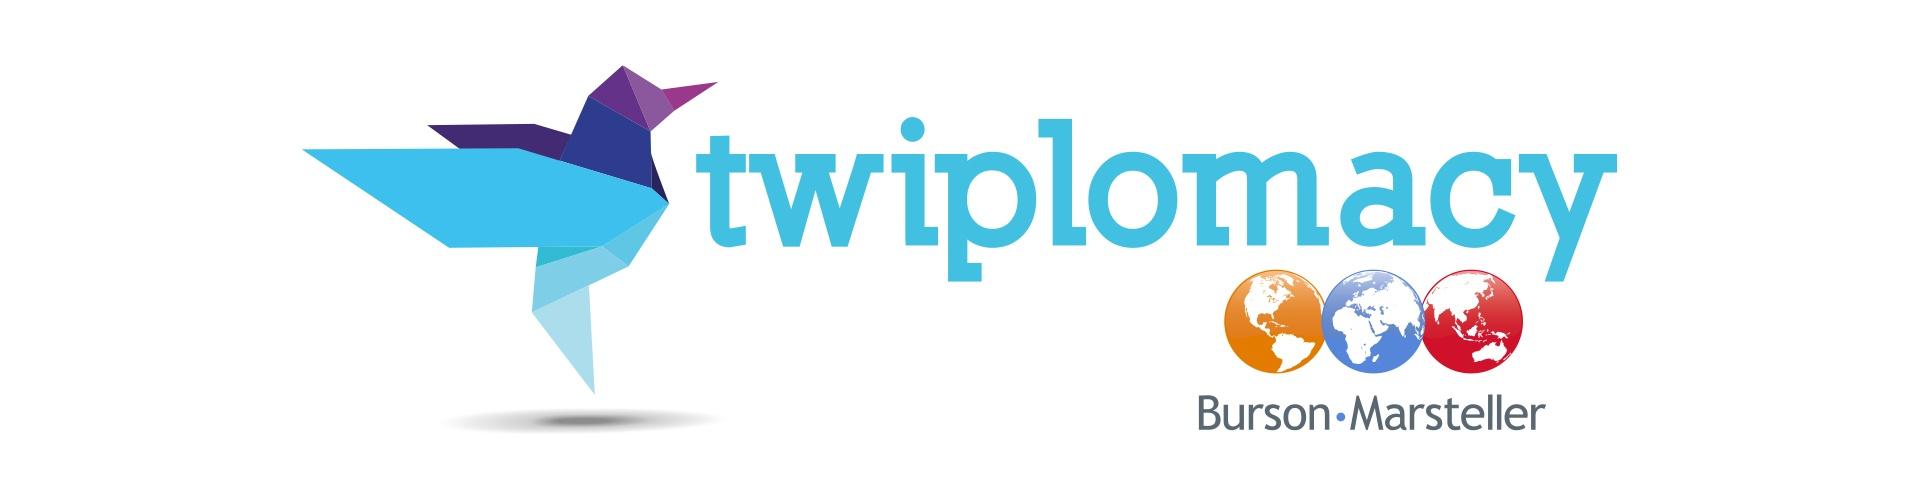 twiplomacy_1920x500-1.jpg